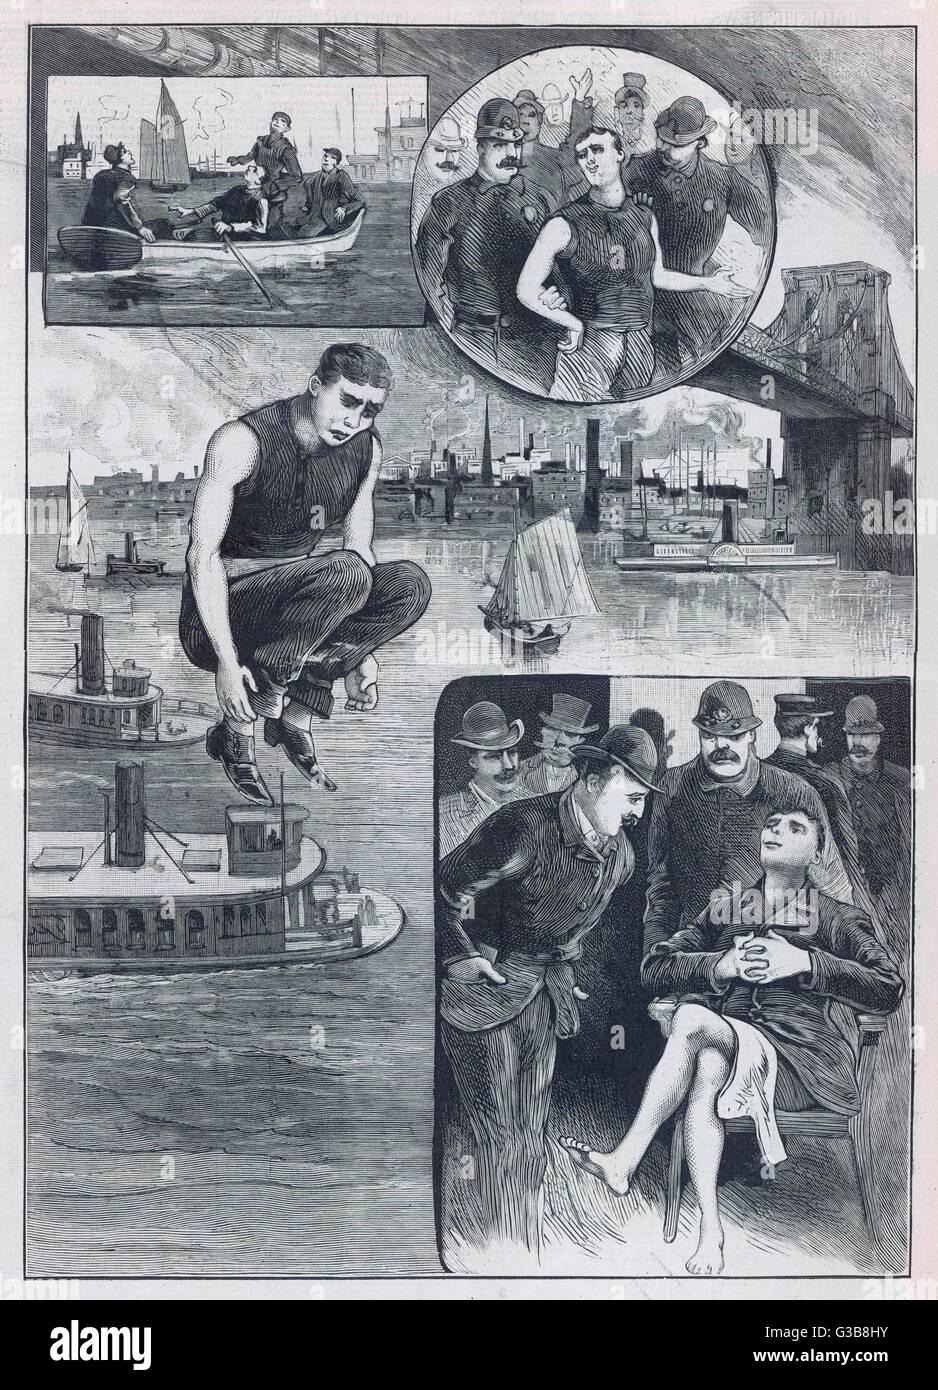 Scenes from Steve Brodie's  leap off the Brooklyn Bridge         Date: 1886 - Stock Image